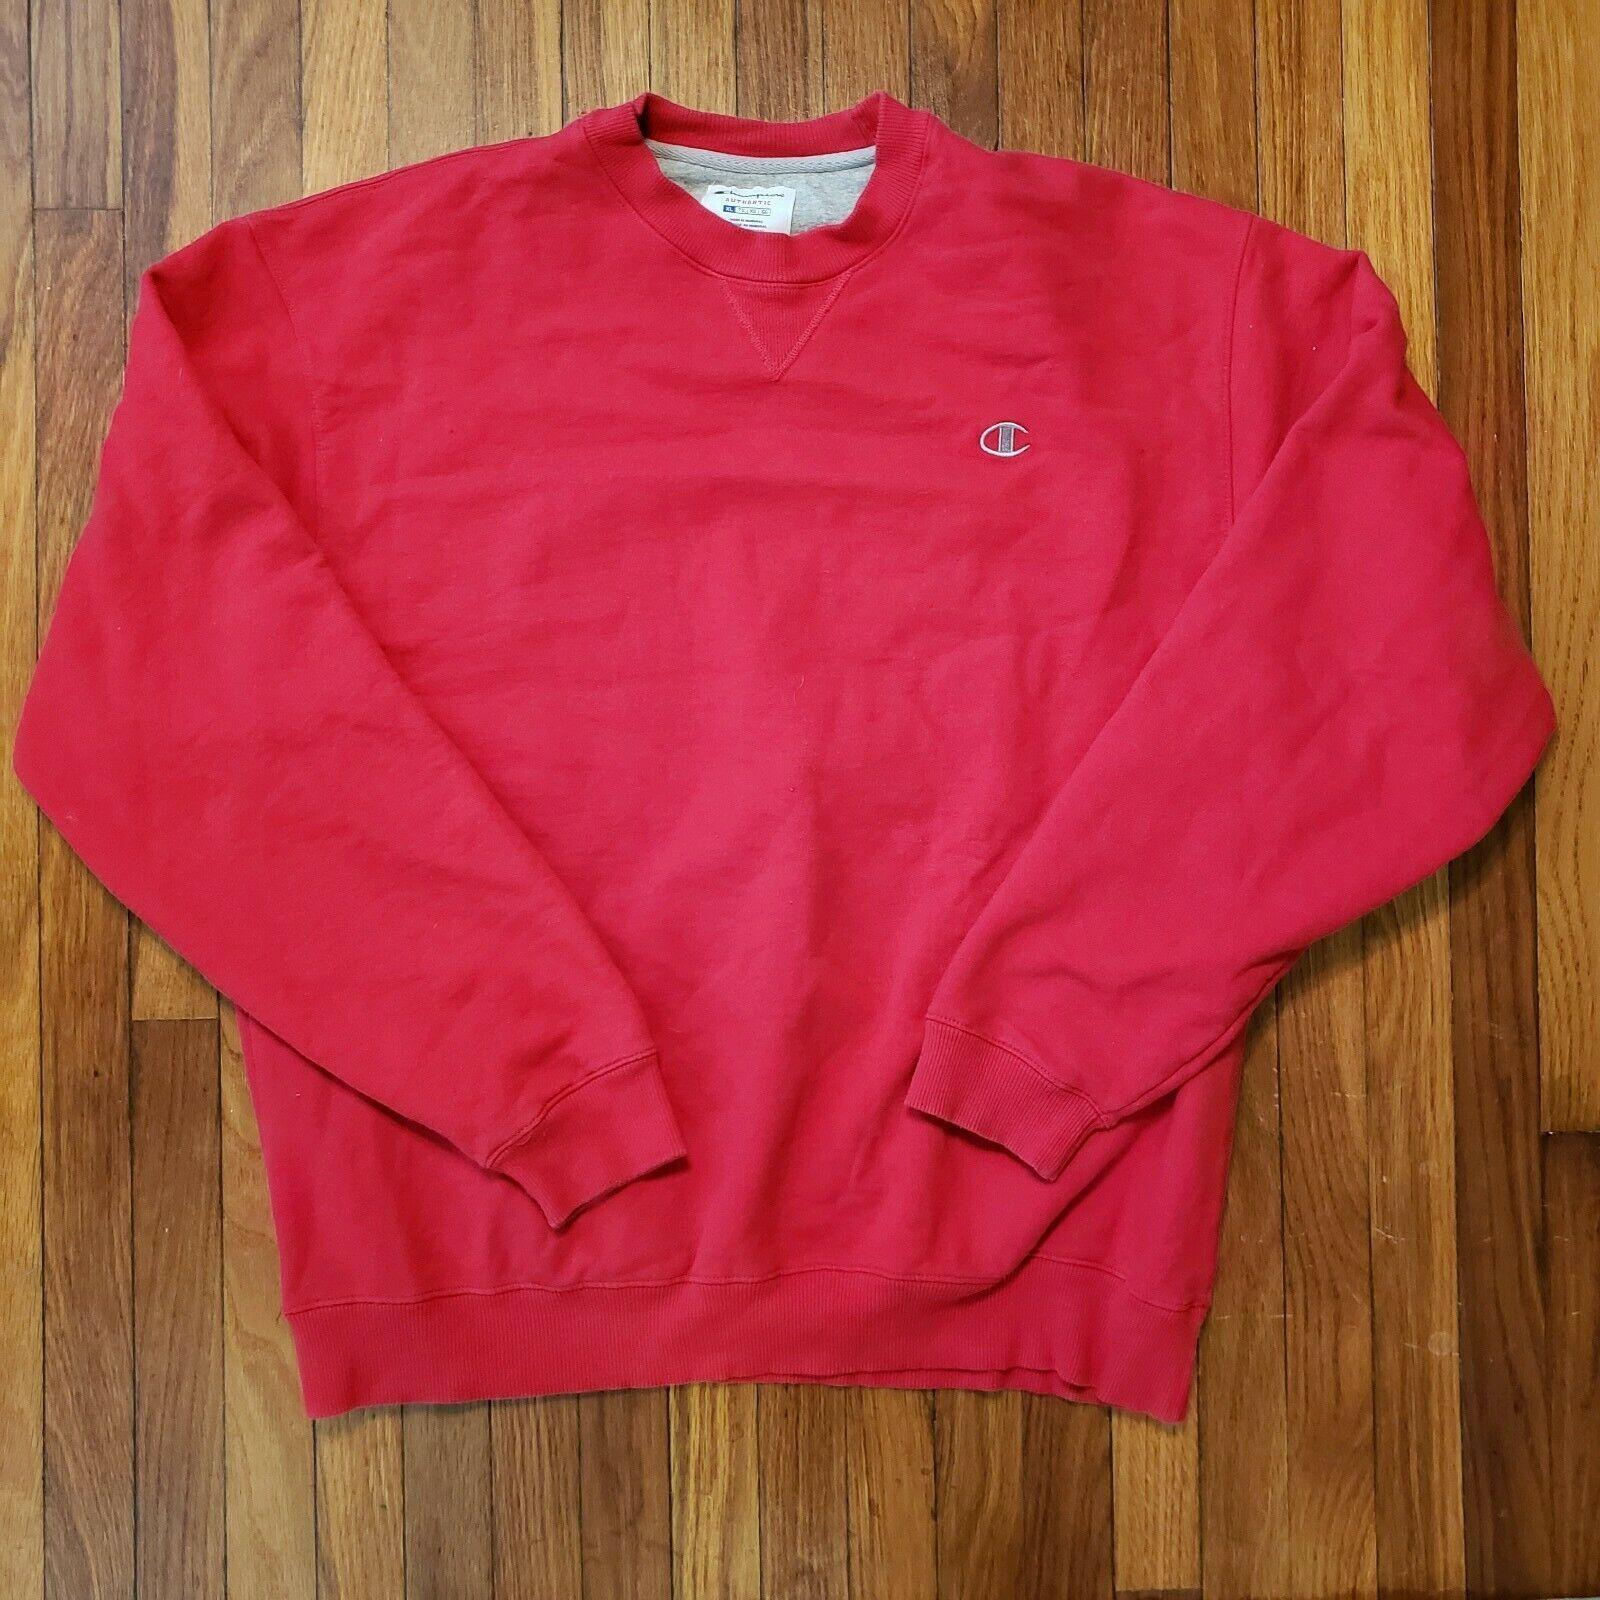 Champion Bright Red Pullover Sweatshirt Men's Size XL